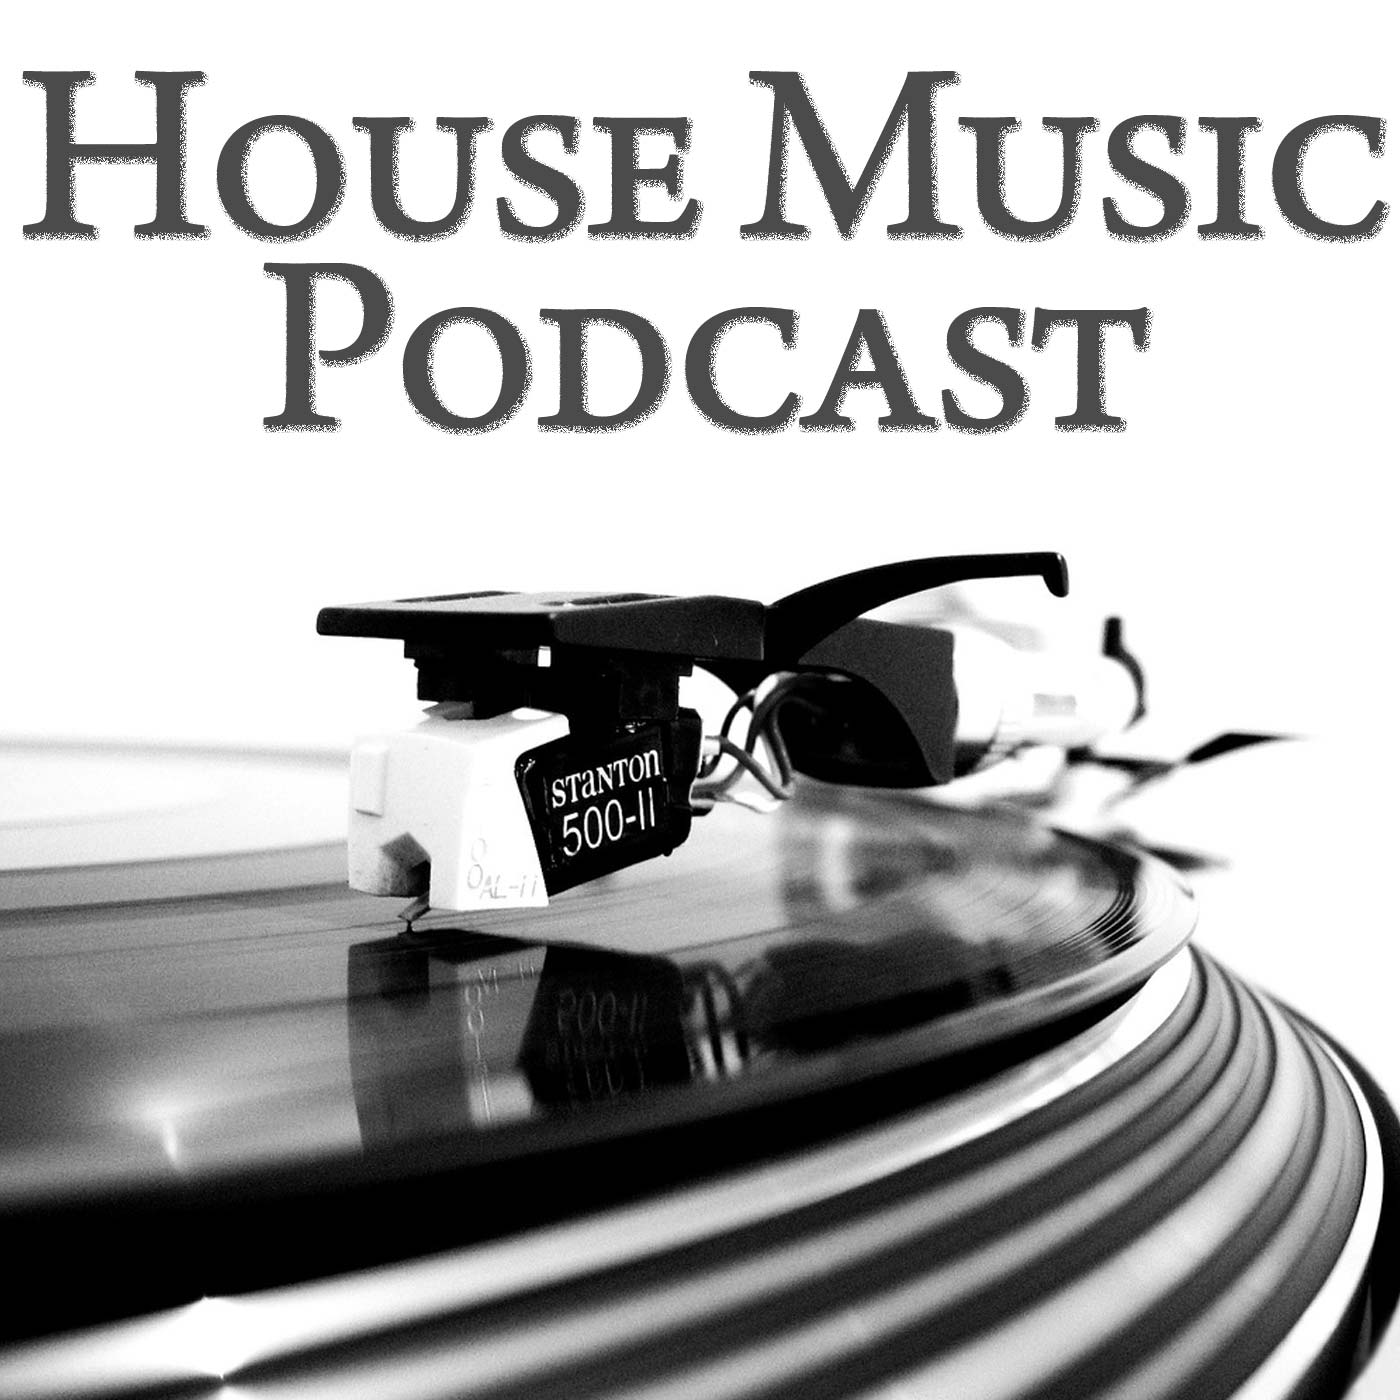 House Music Podcast mixed by DJ Sascha Lupeski!